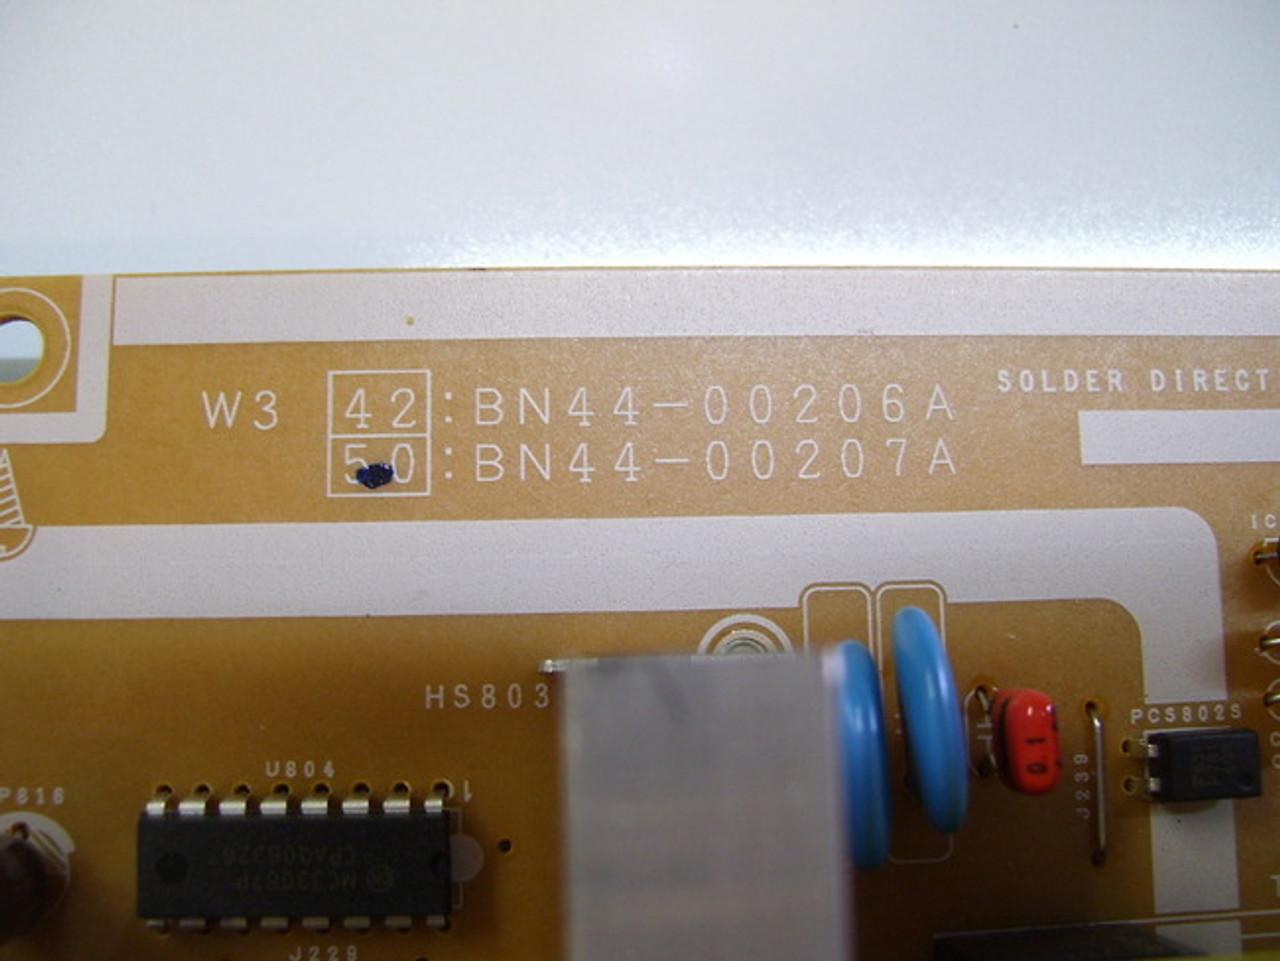 Samsung PN50A450P1DXZA Power Supply board PSPF521701A / BN44-00207A chipped corner